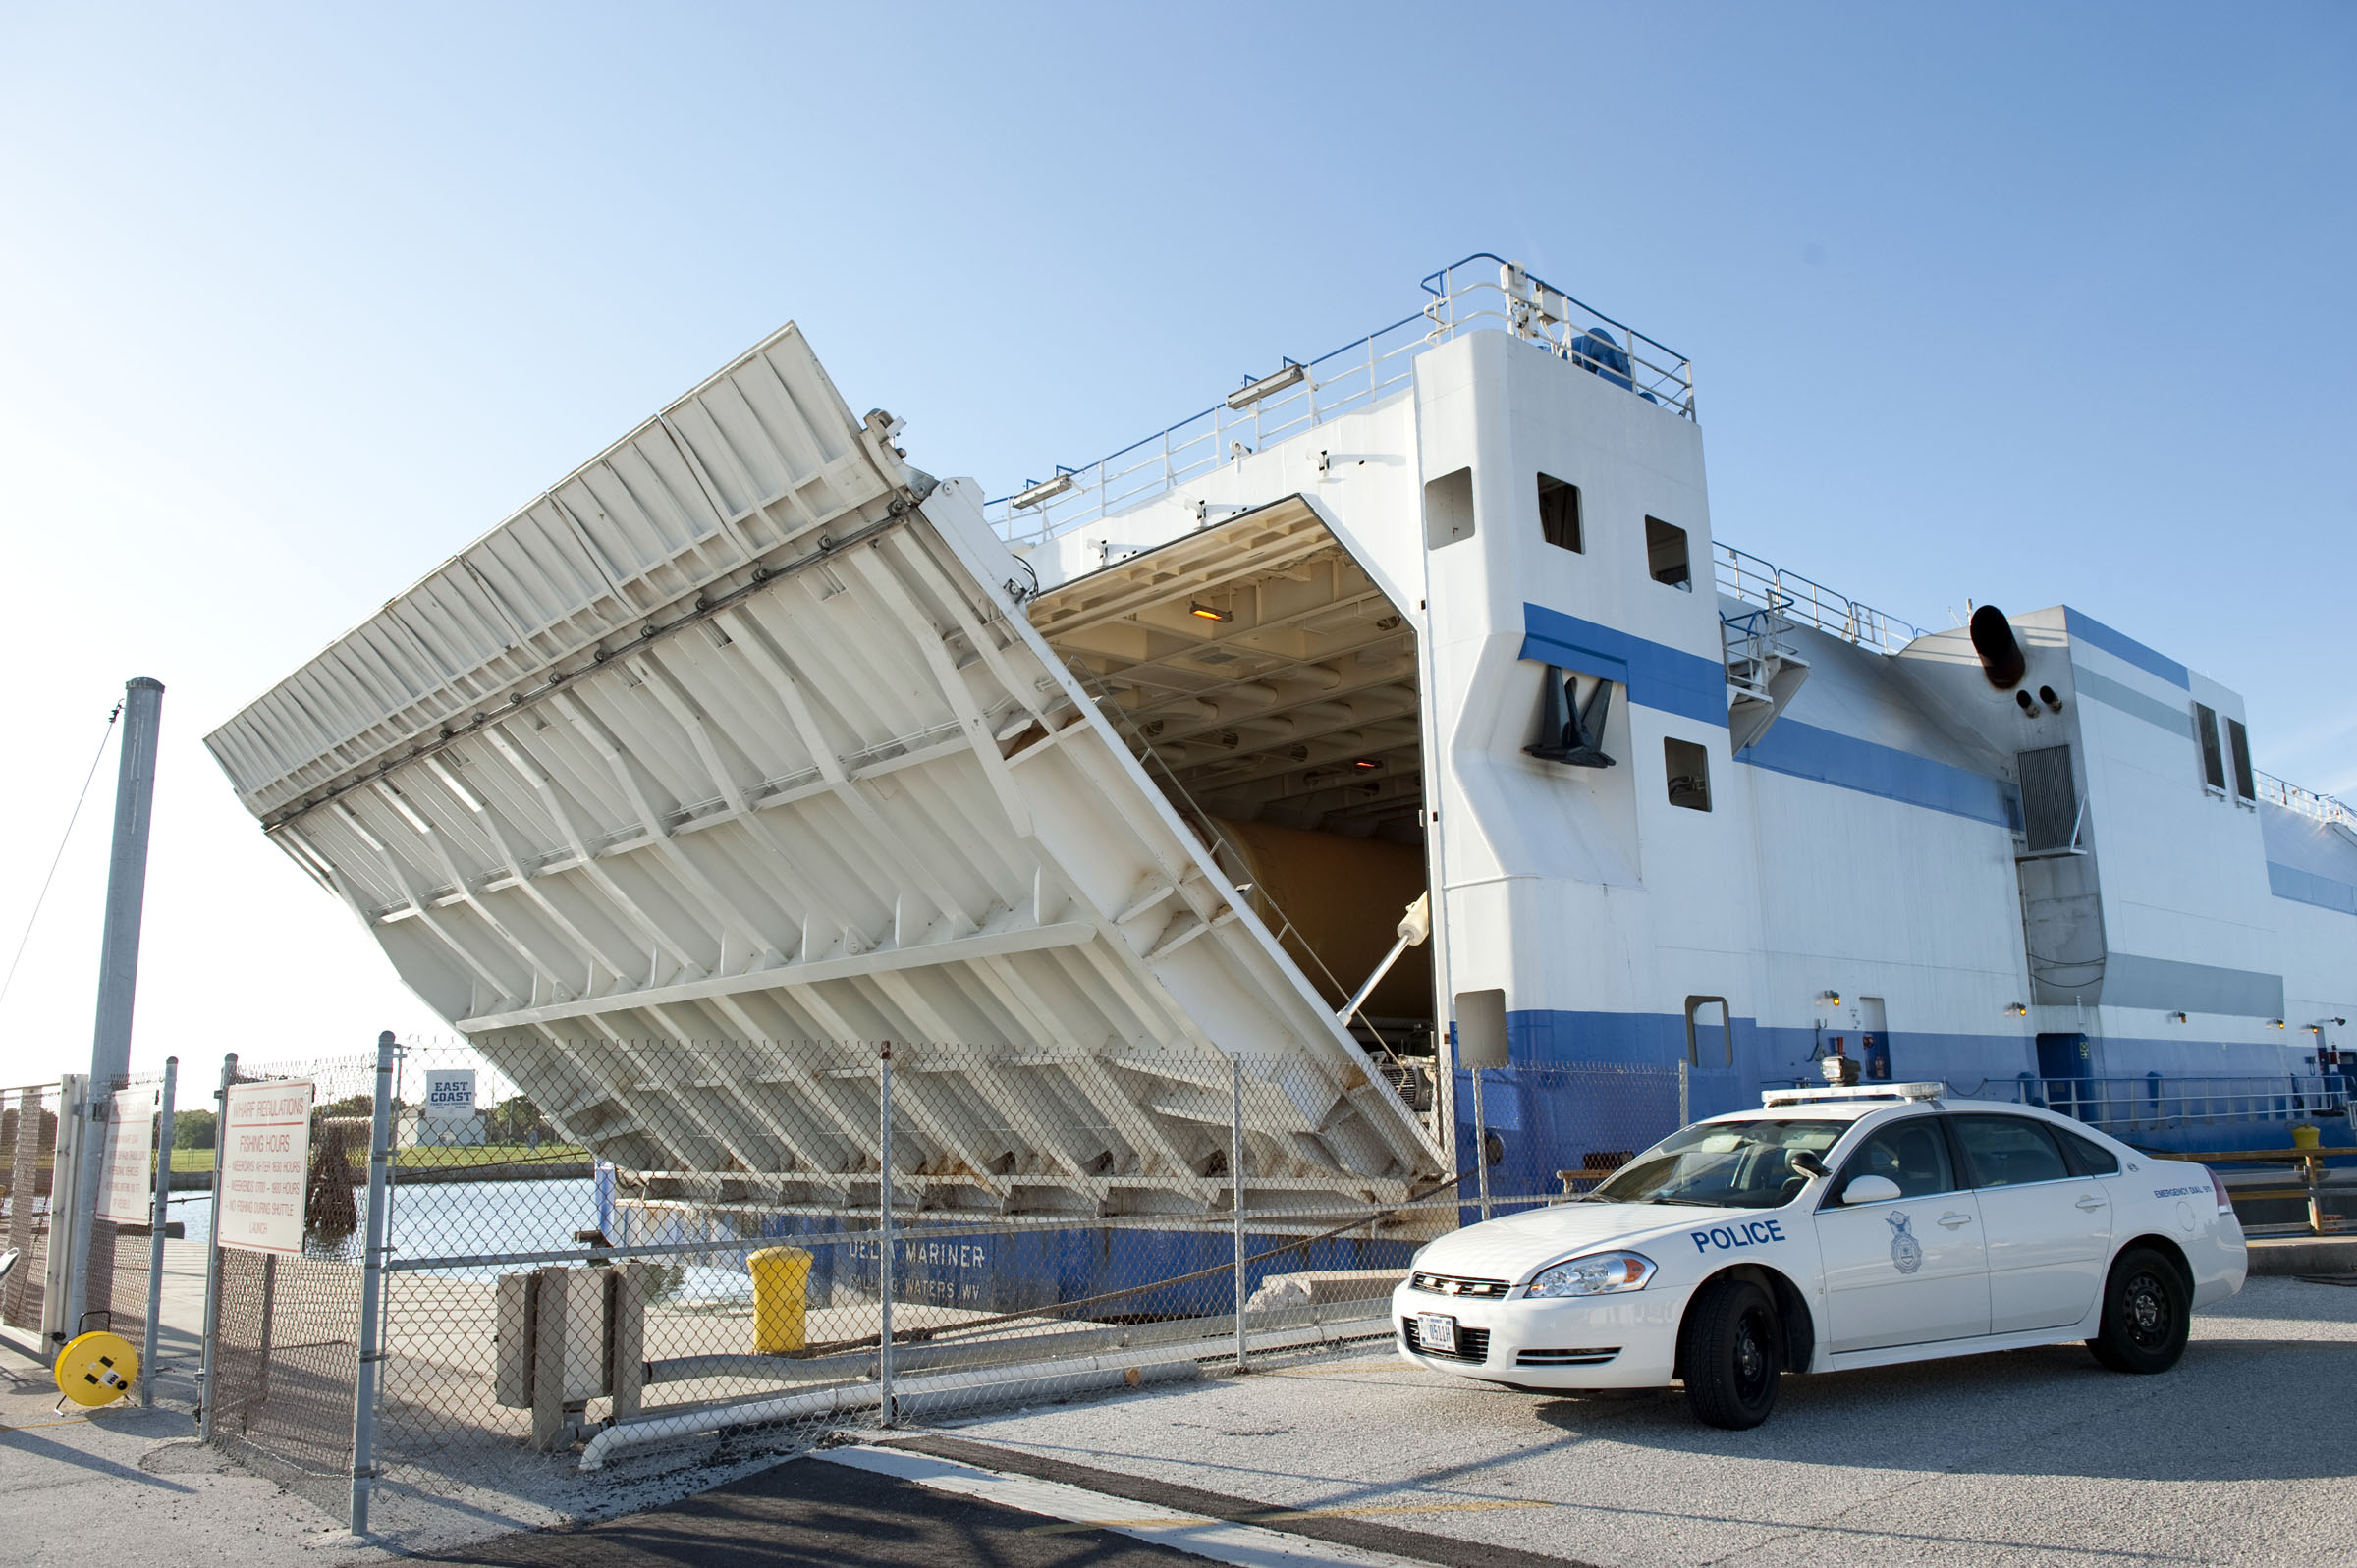 Boat Carrying Atlas Rocket Crashes Into Bridge